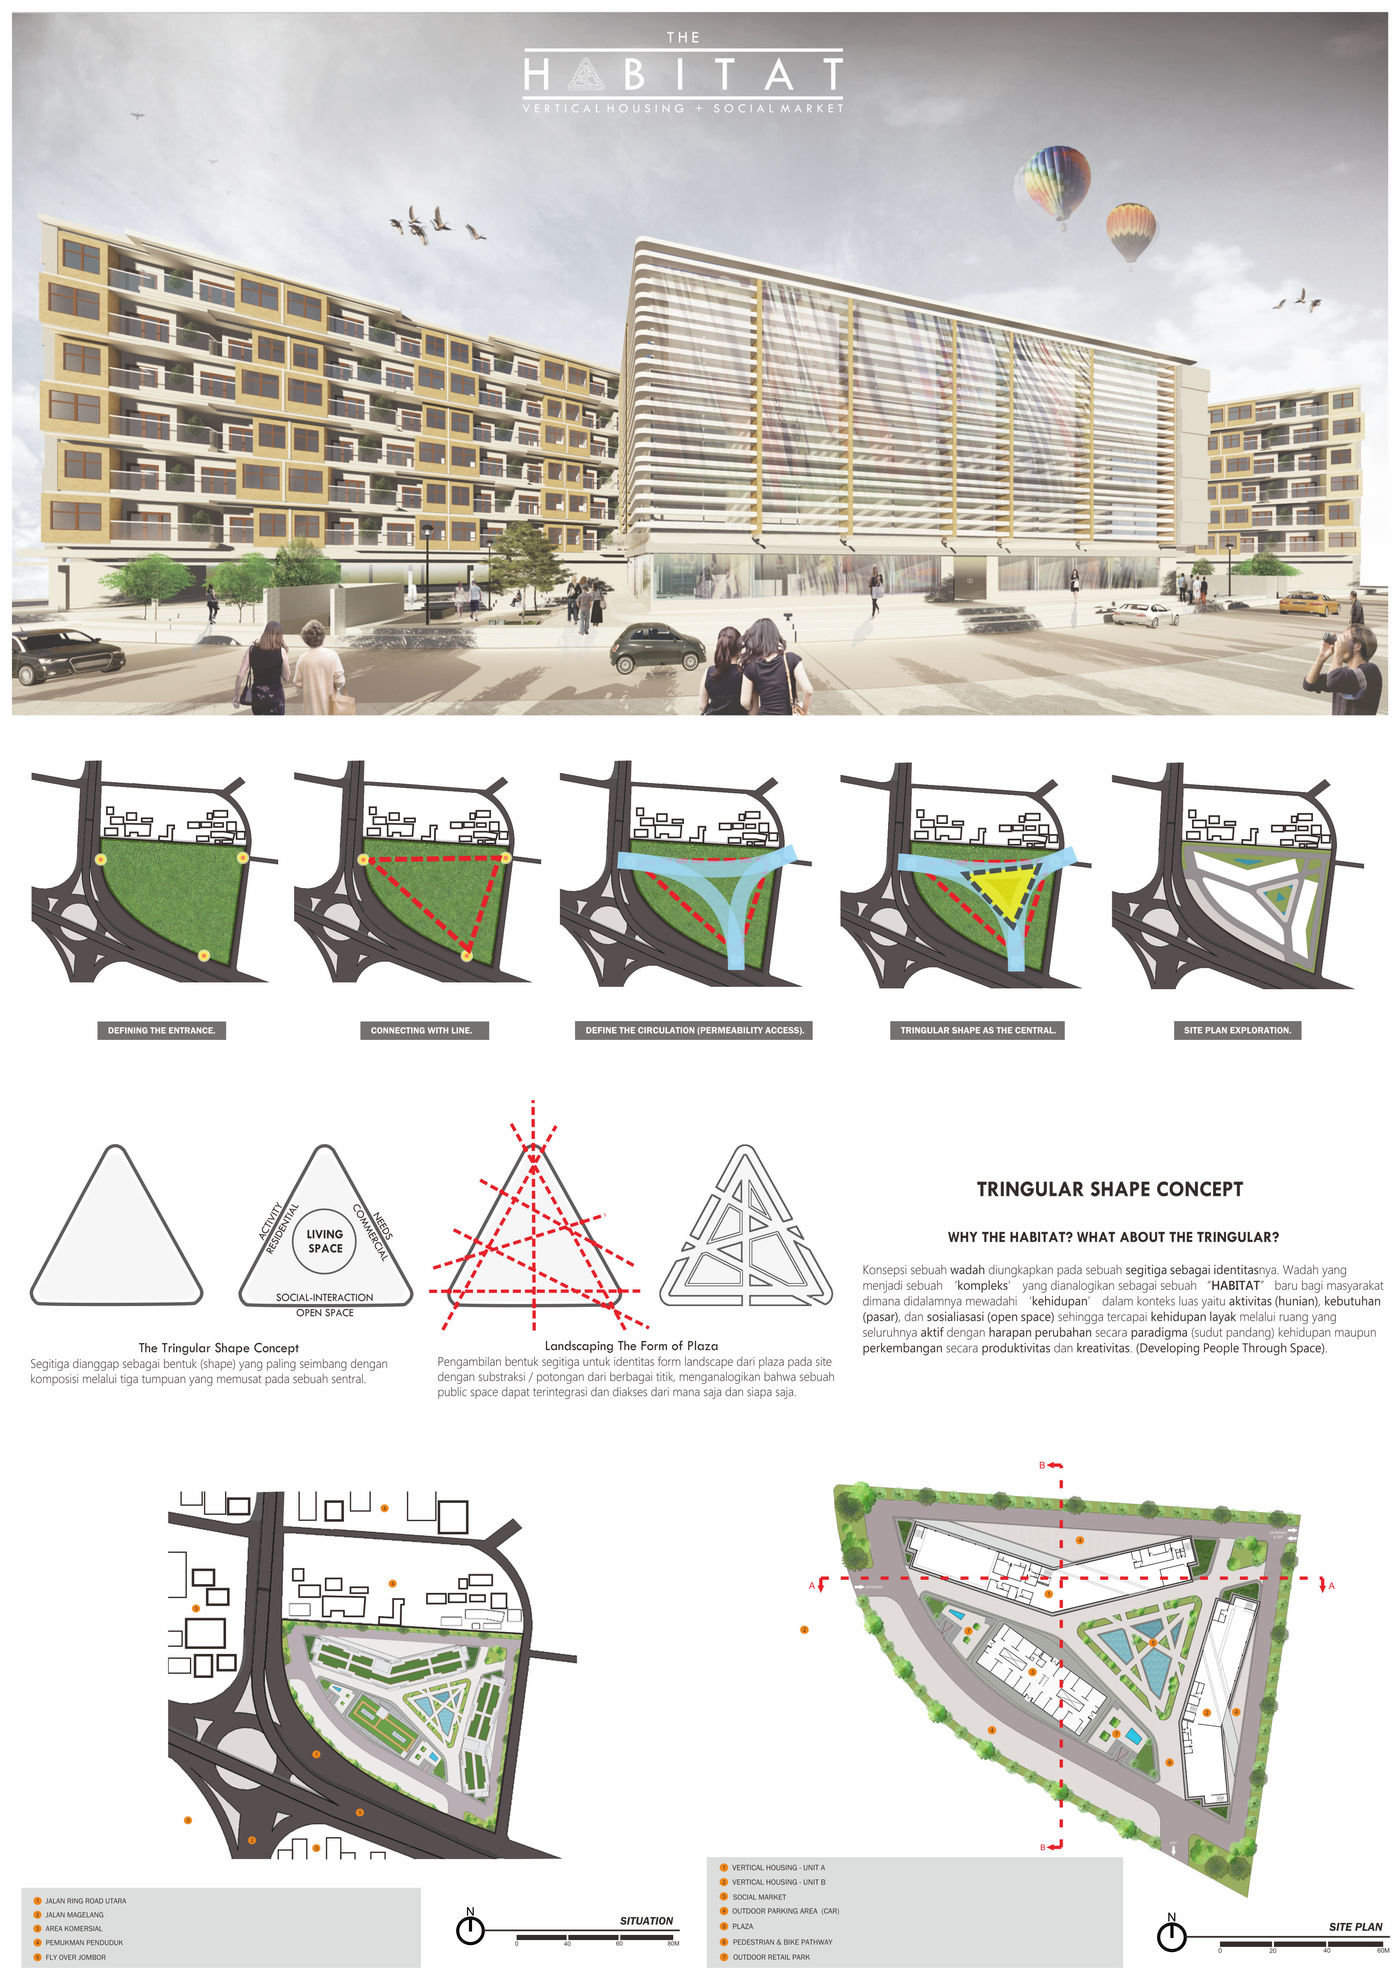 Studio #6: The Habitat - Vertical Housing + Social Market by Christopher Bahana at Coroflot.com